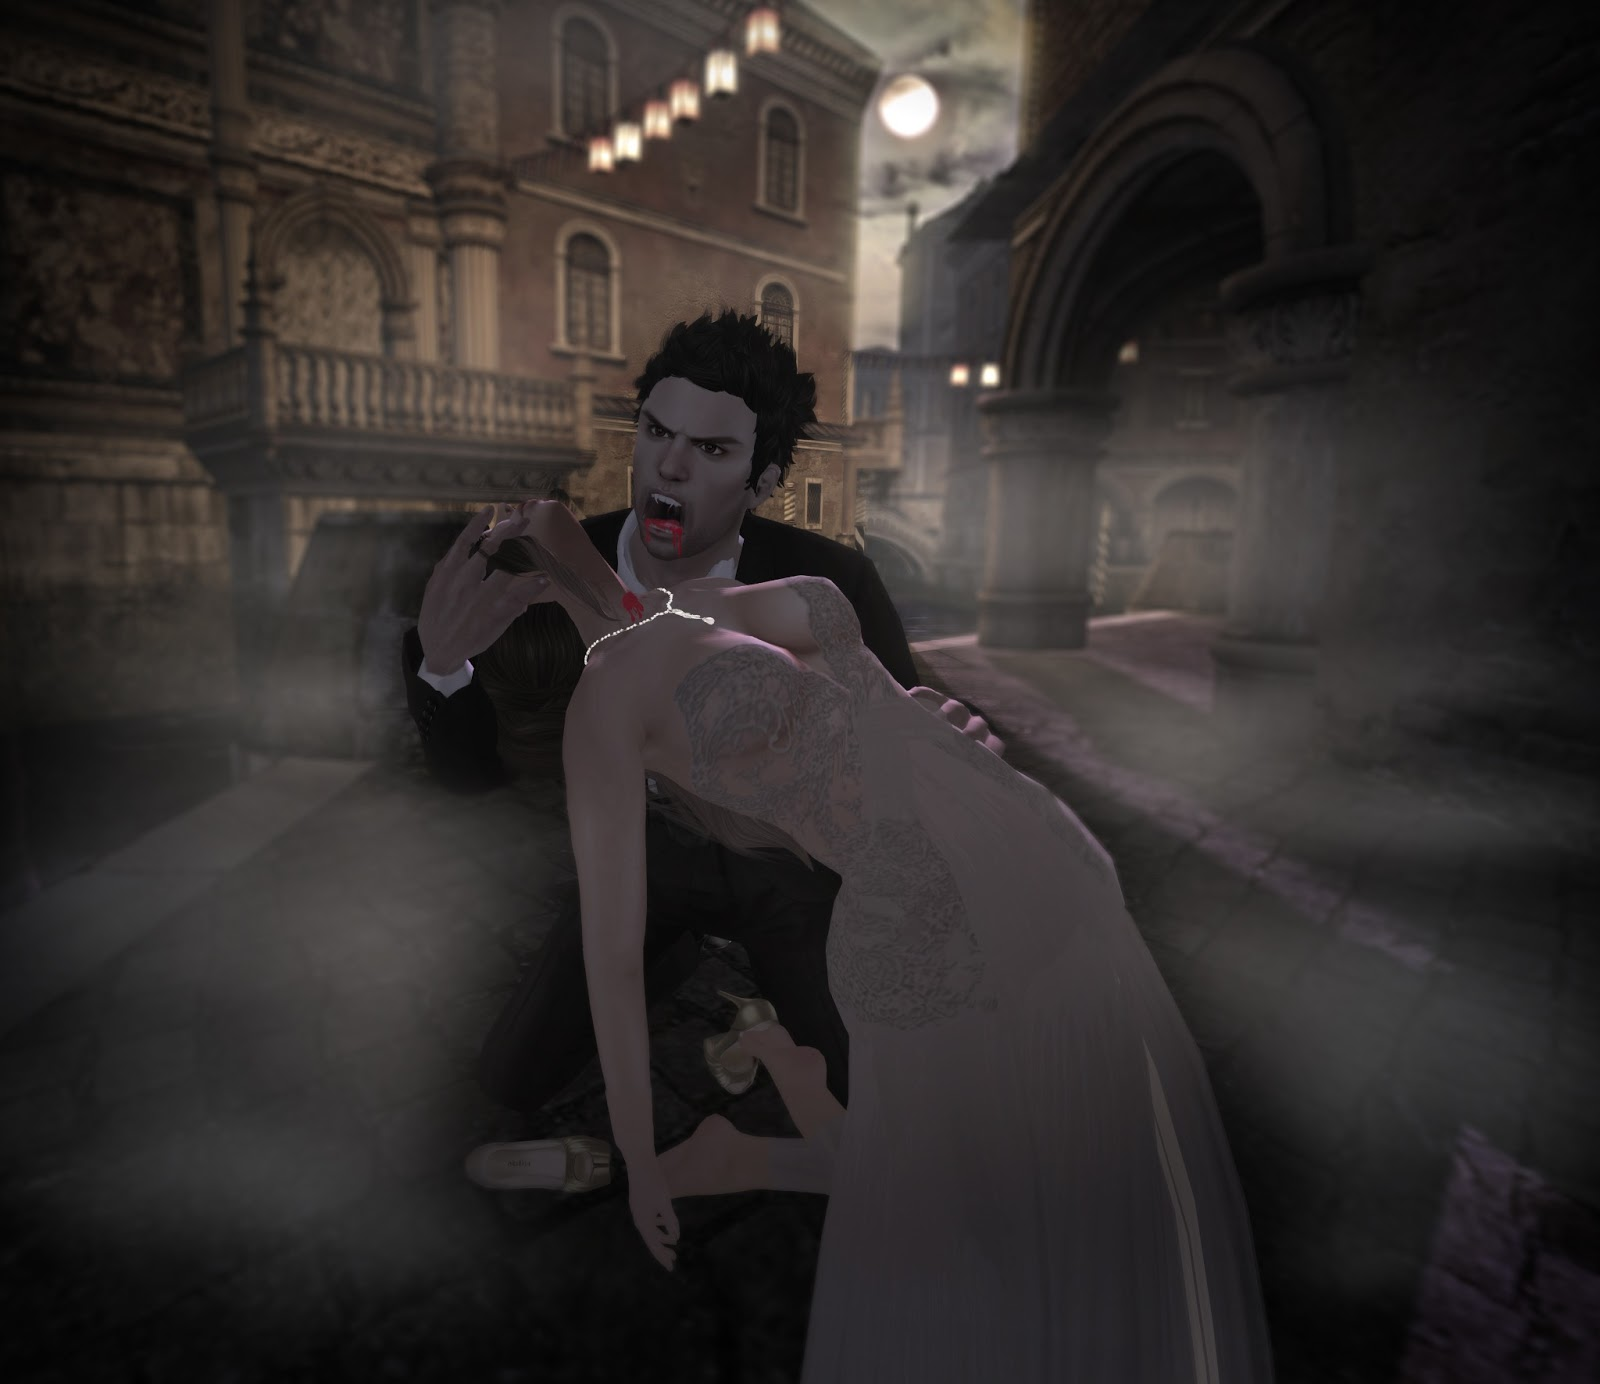 vampires biting people - photo #1